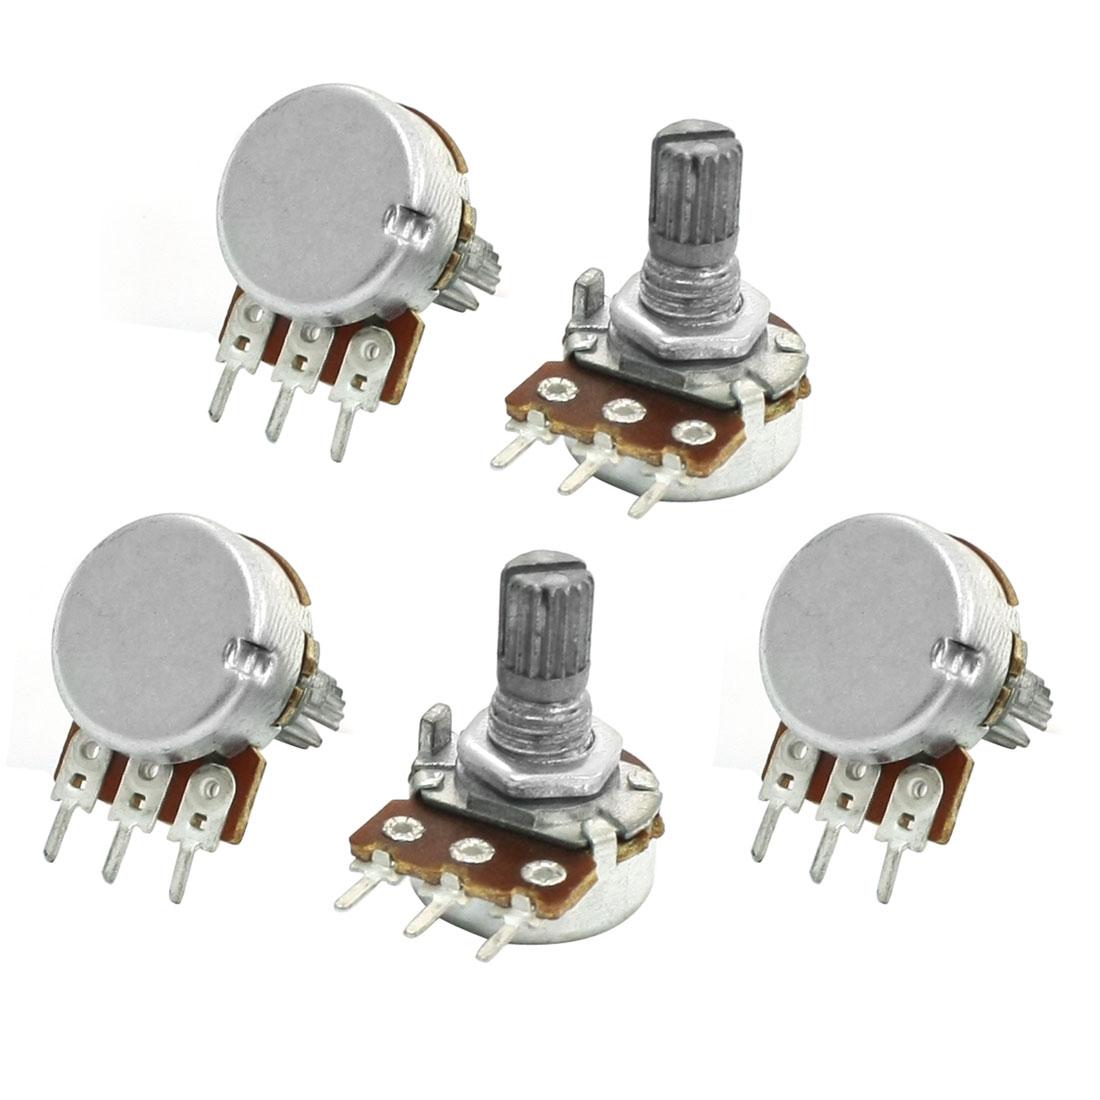 5pcs 6mm Shaft 3 Pin Pots Single Turn Adjustment Potentiometer 500K ohm